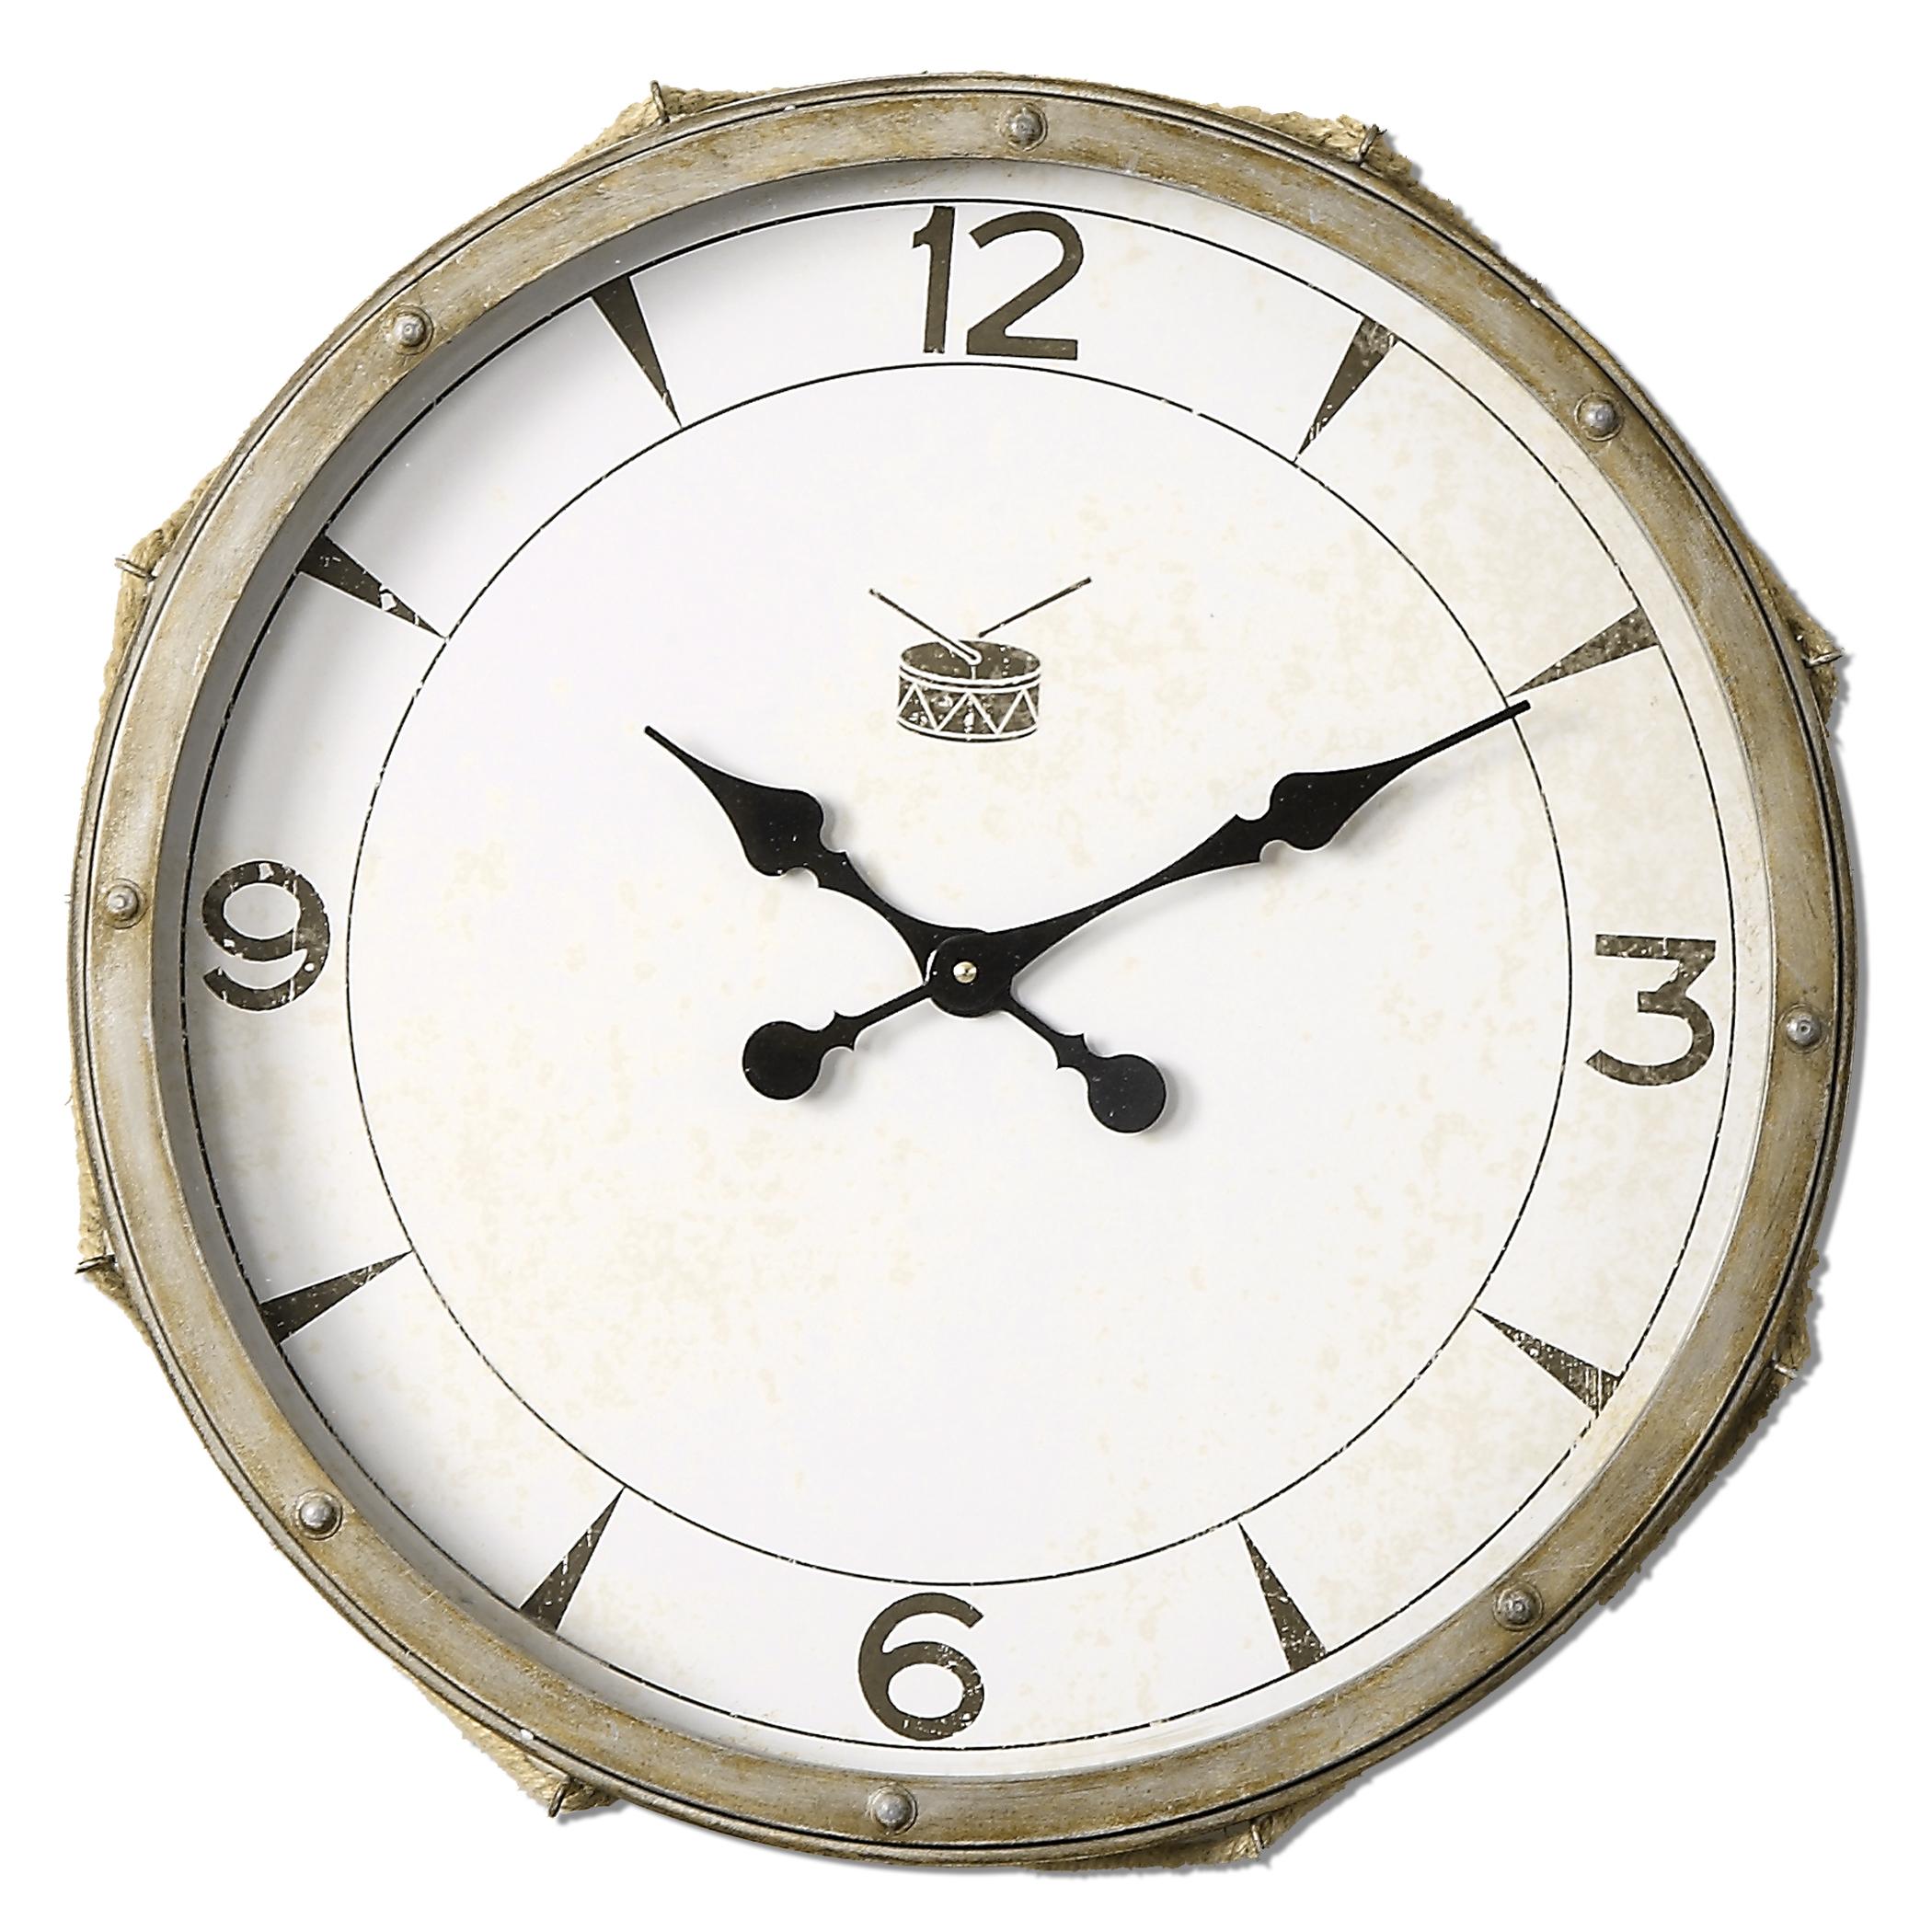 Uttermost Clocks Rope Snare Clock - Item Number: 06429